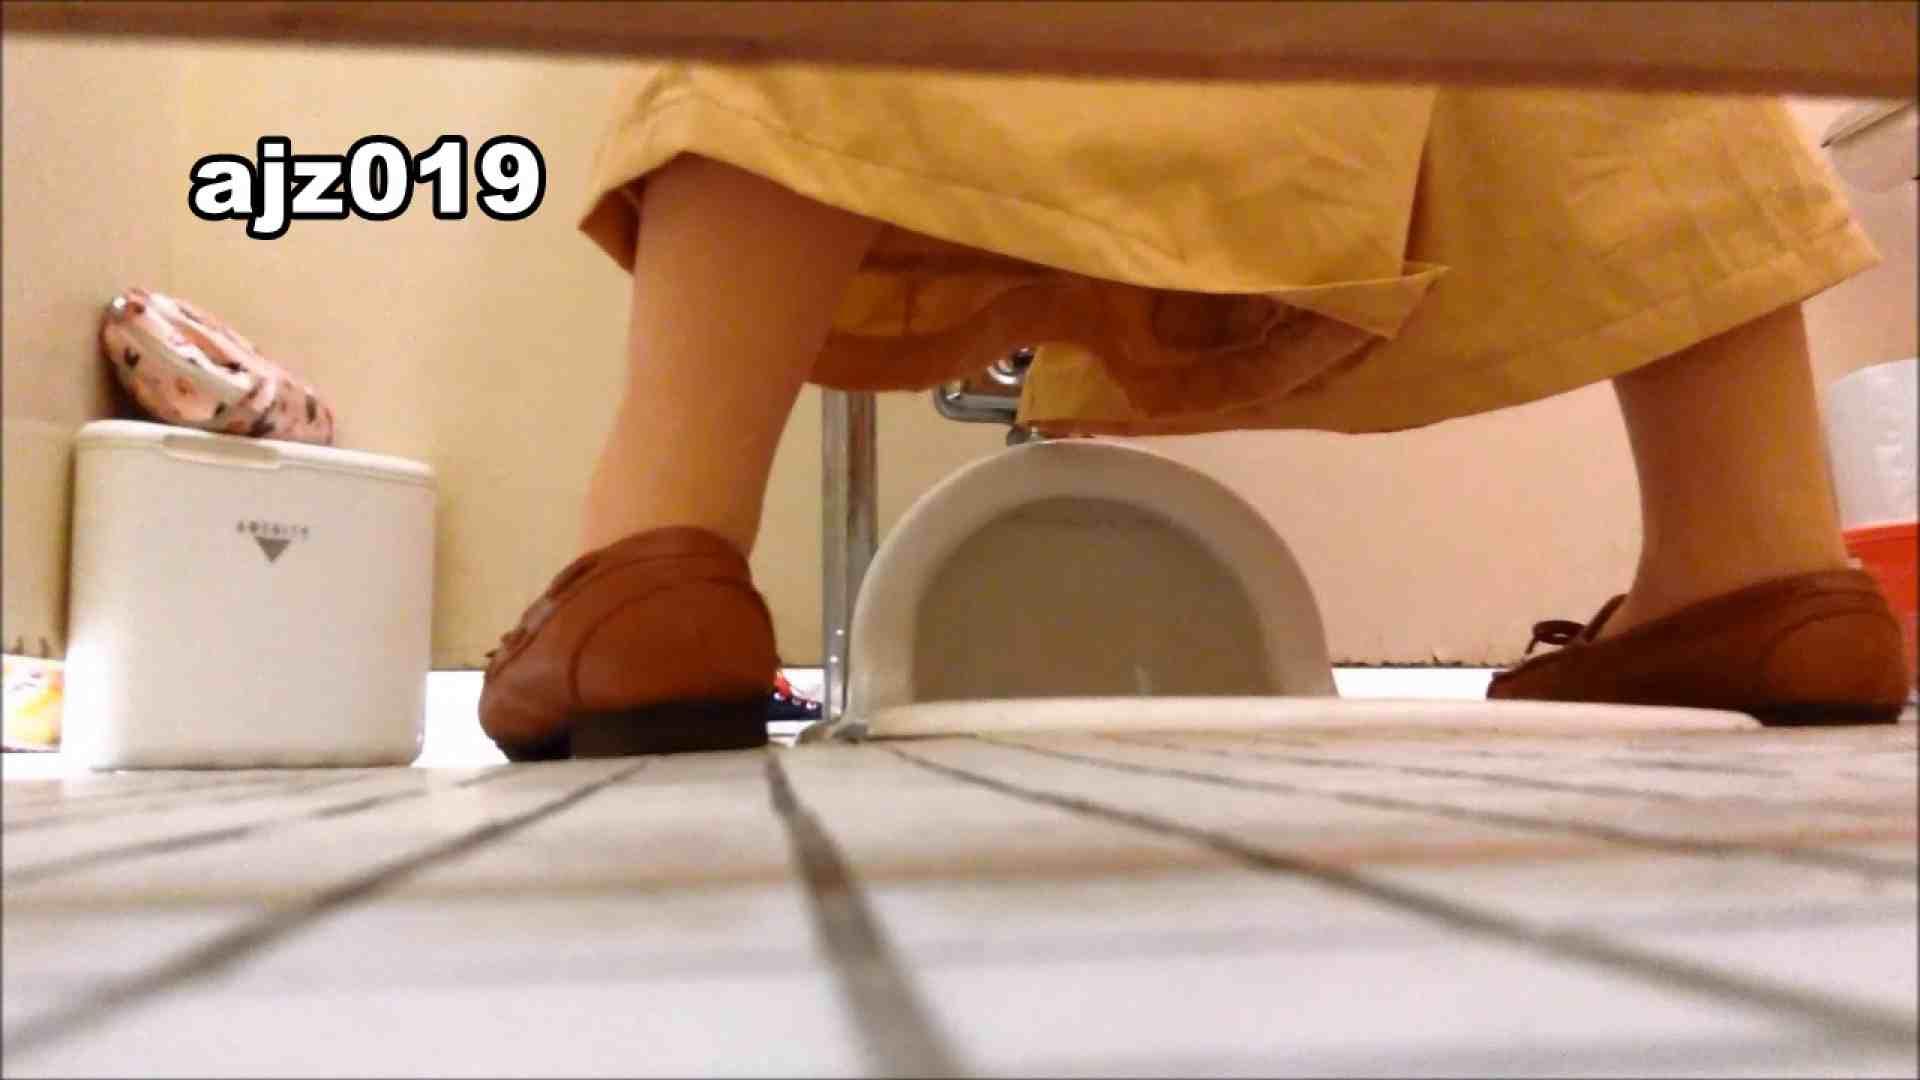 某有名大学女性洗面所 vol.19 OLのエロ生活 オマンコ無修正動画無料 82連発 14